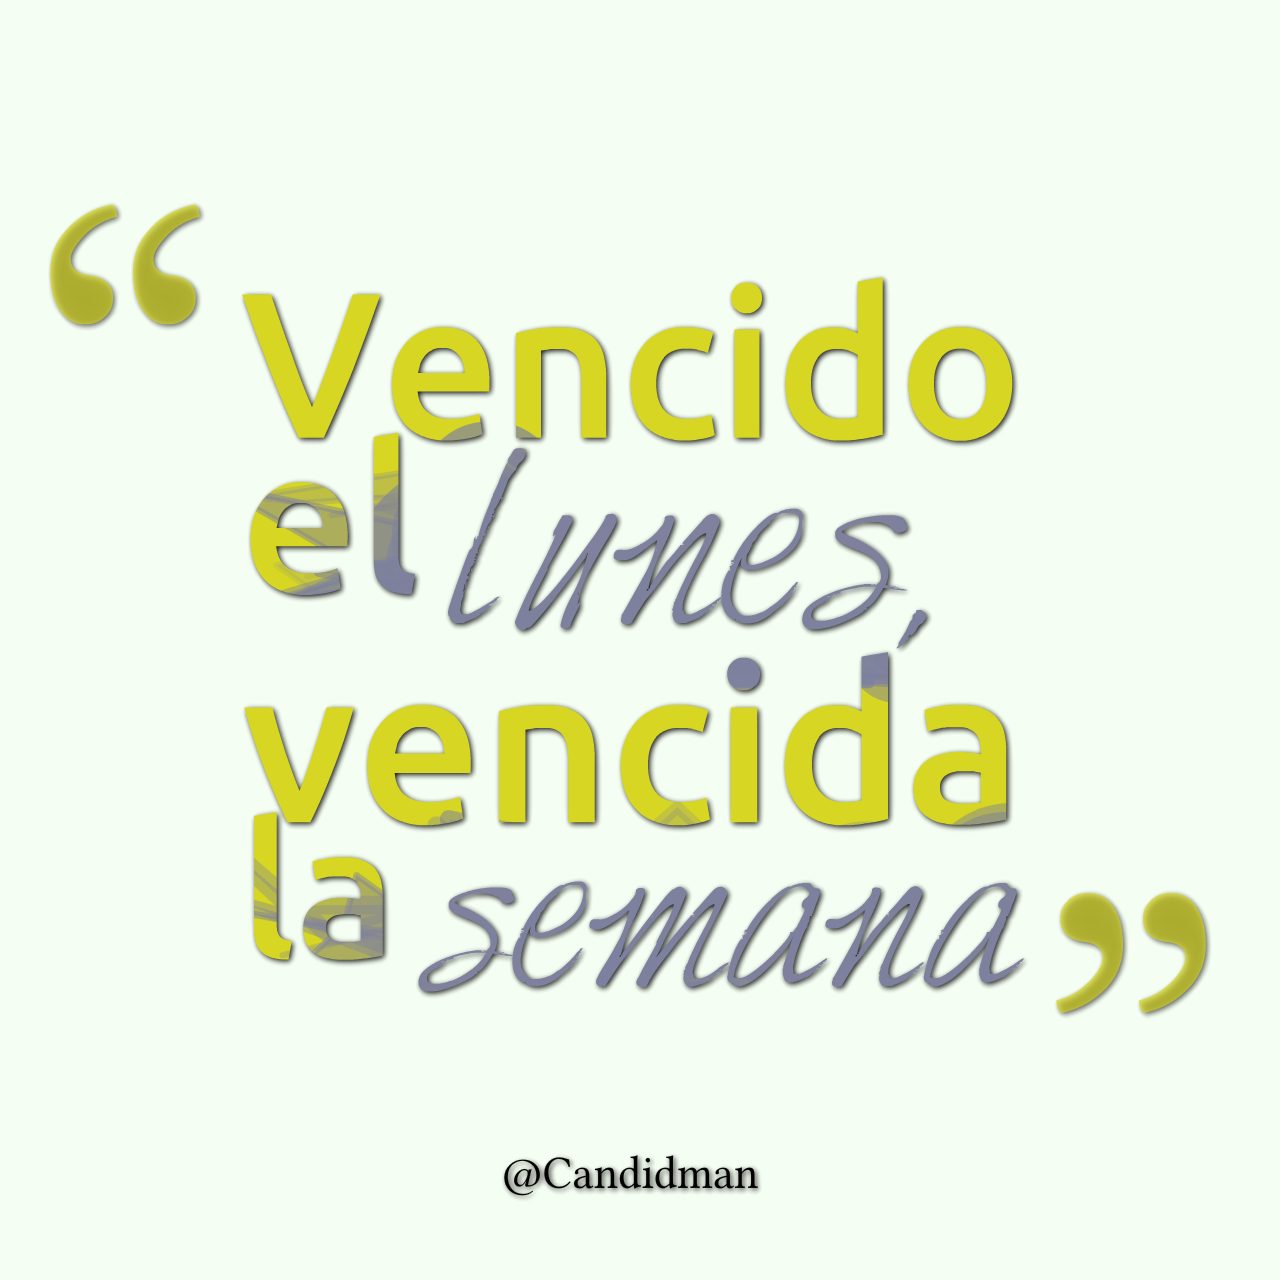 """Vencido el #Lunes, vencida la #Semana"". #Citas #Frases @Candidman"